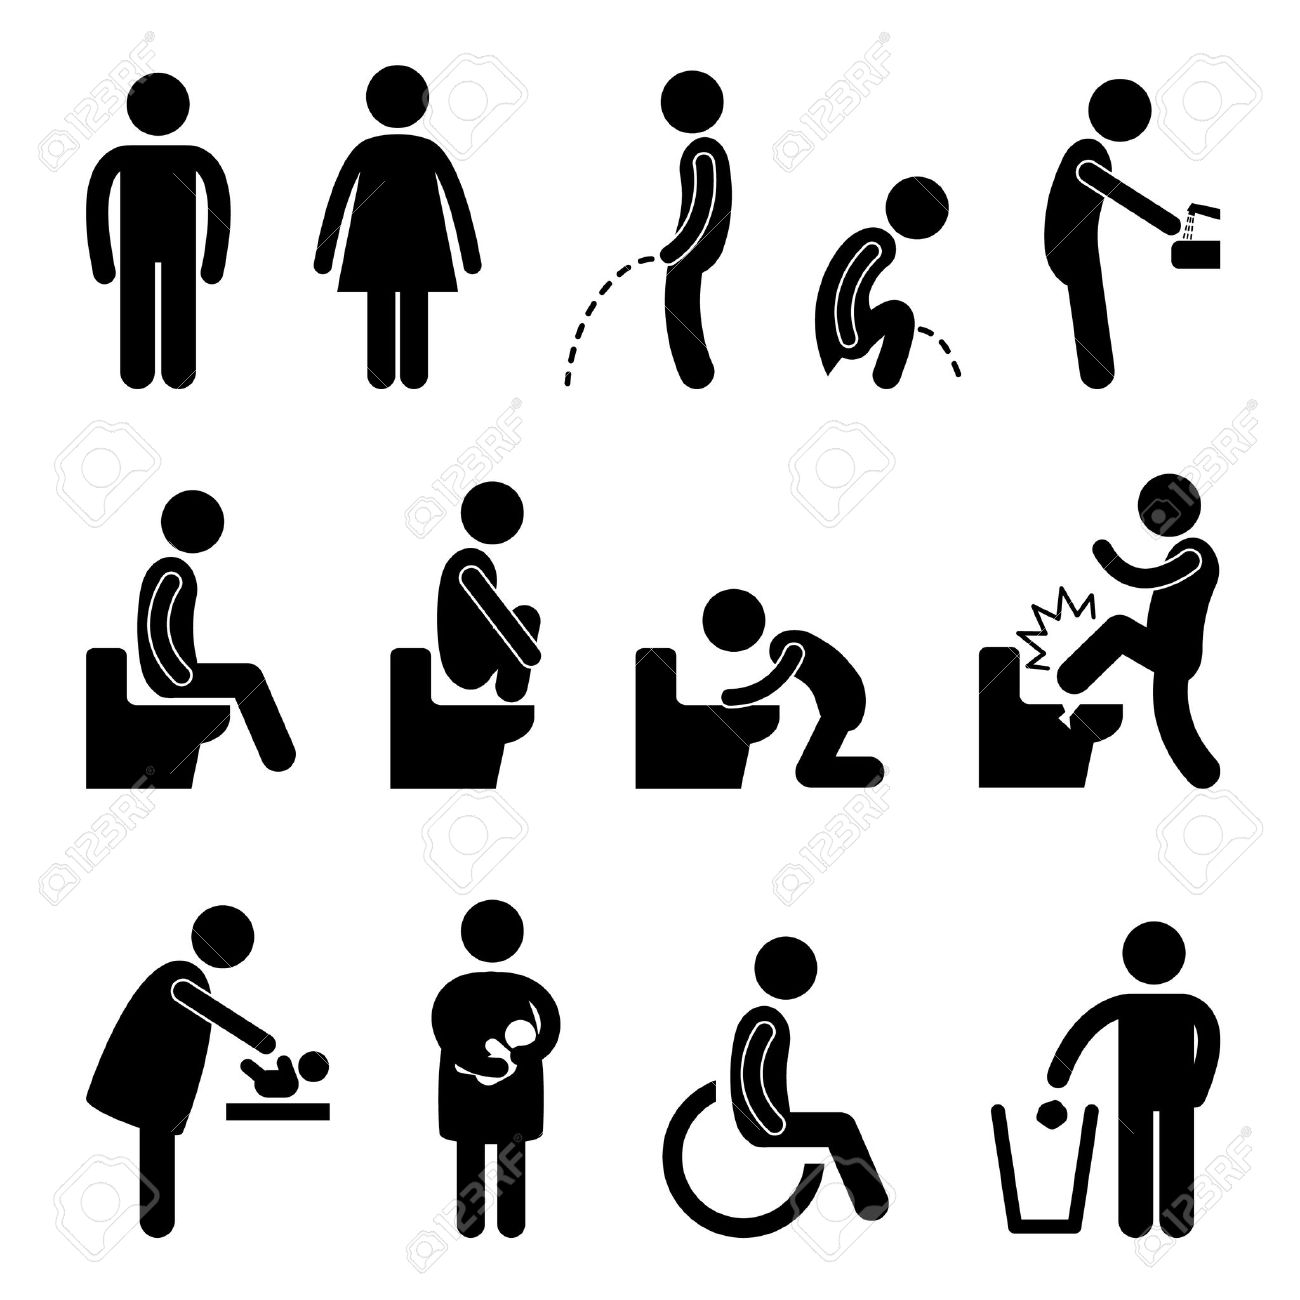 Male Female Bathroom Symbols Fascinating Toilet Bathroom Male Female Pregnant Handicap Public Sign Symbol Inspiration Design